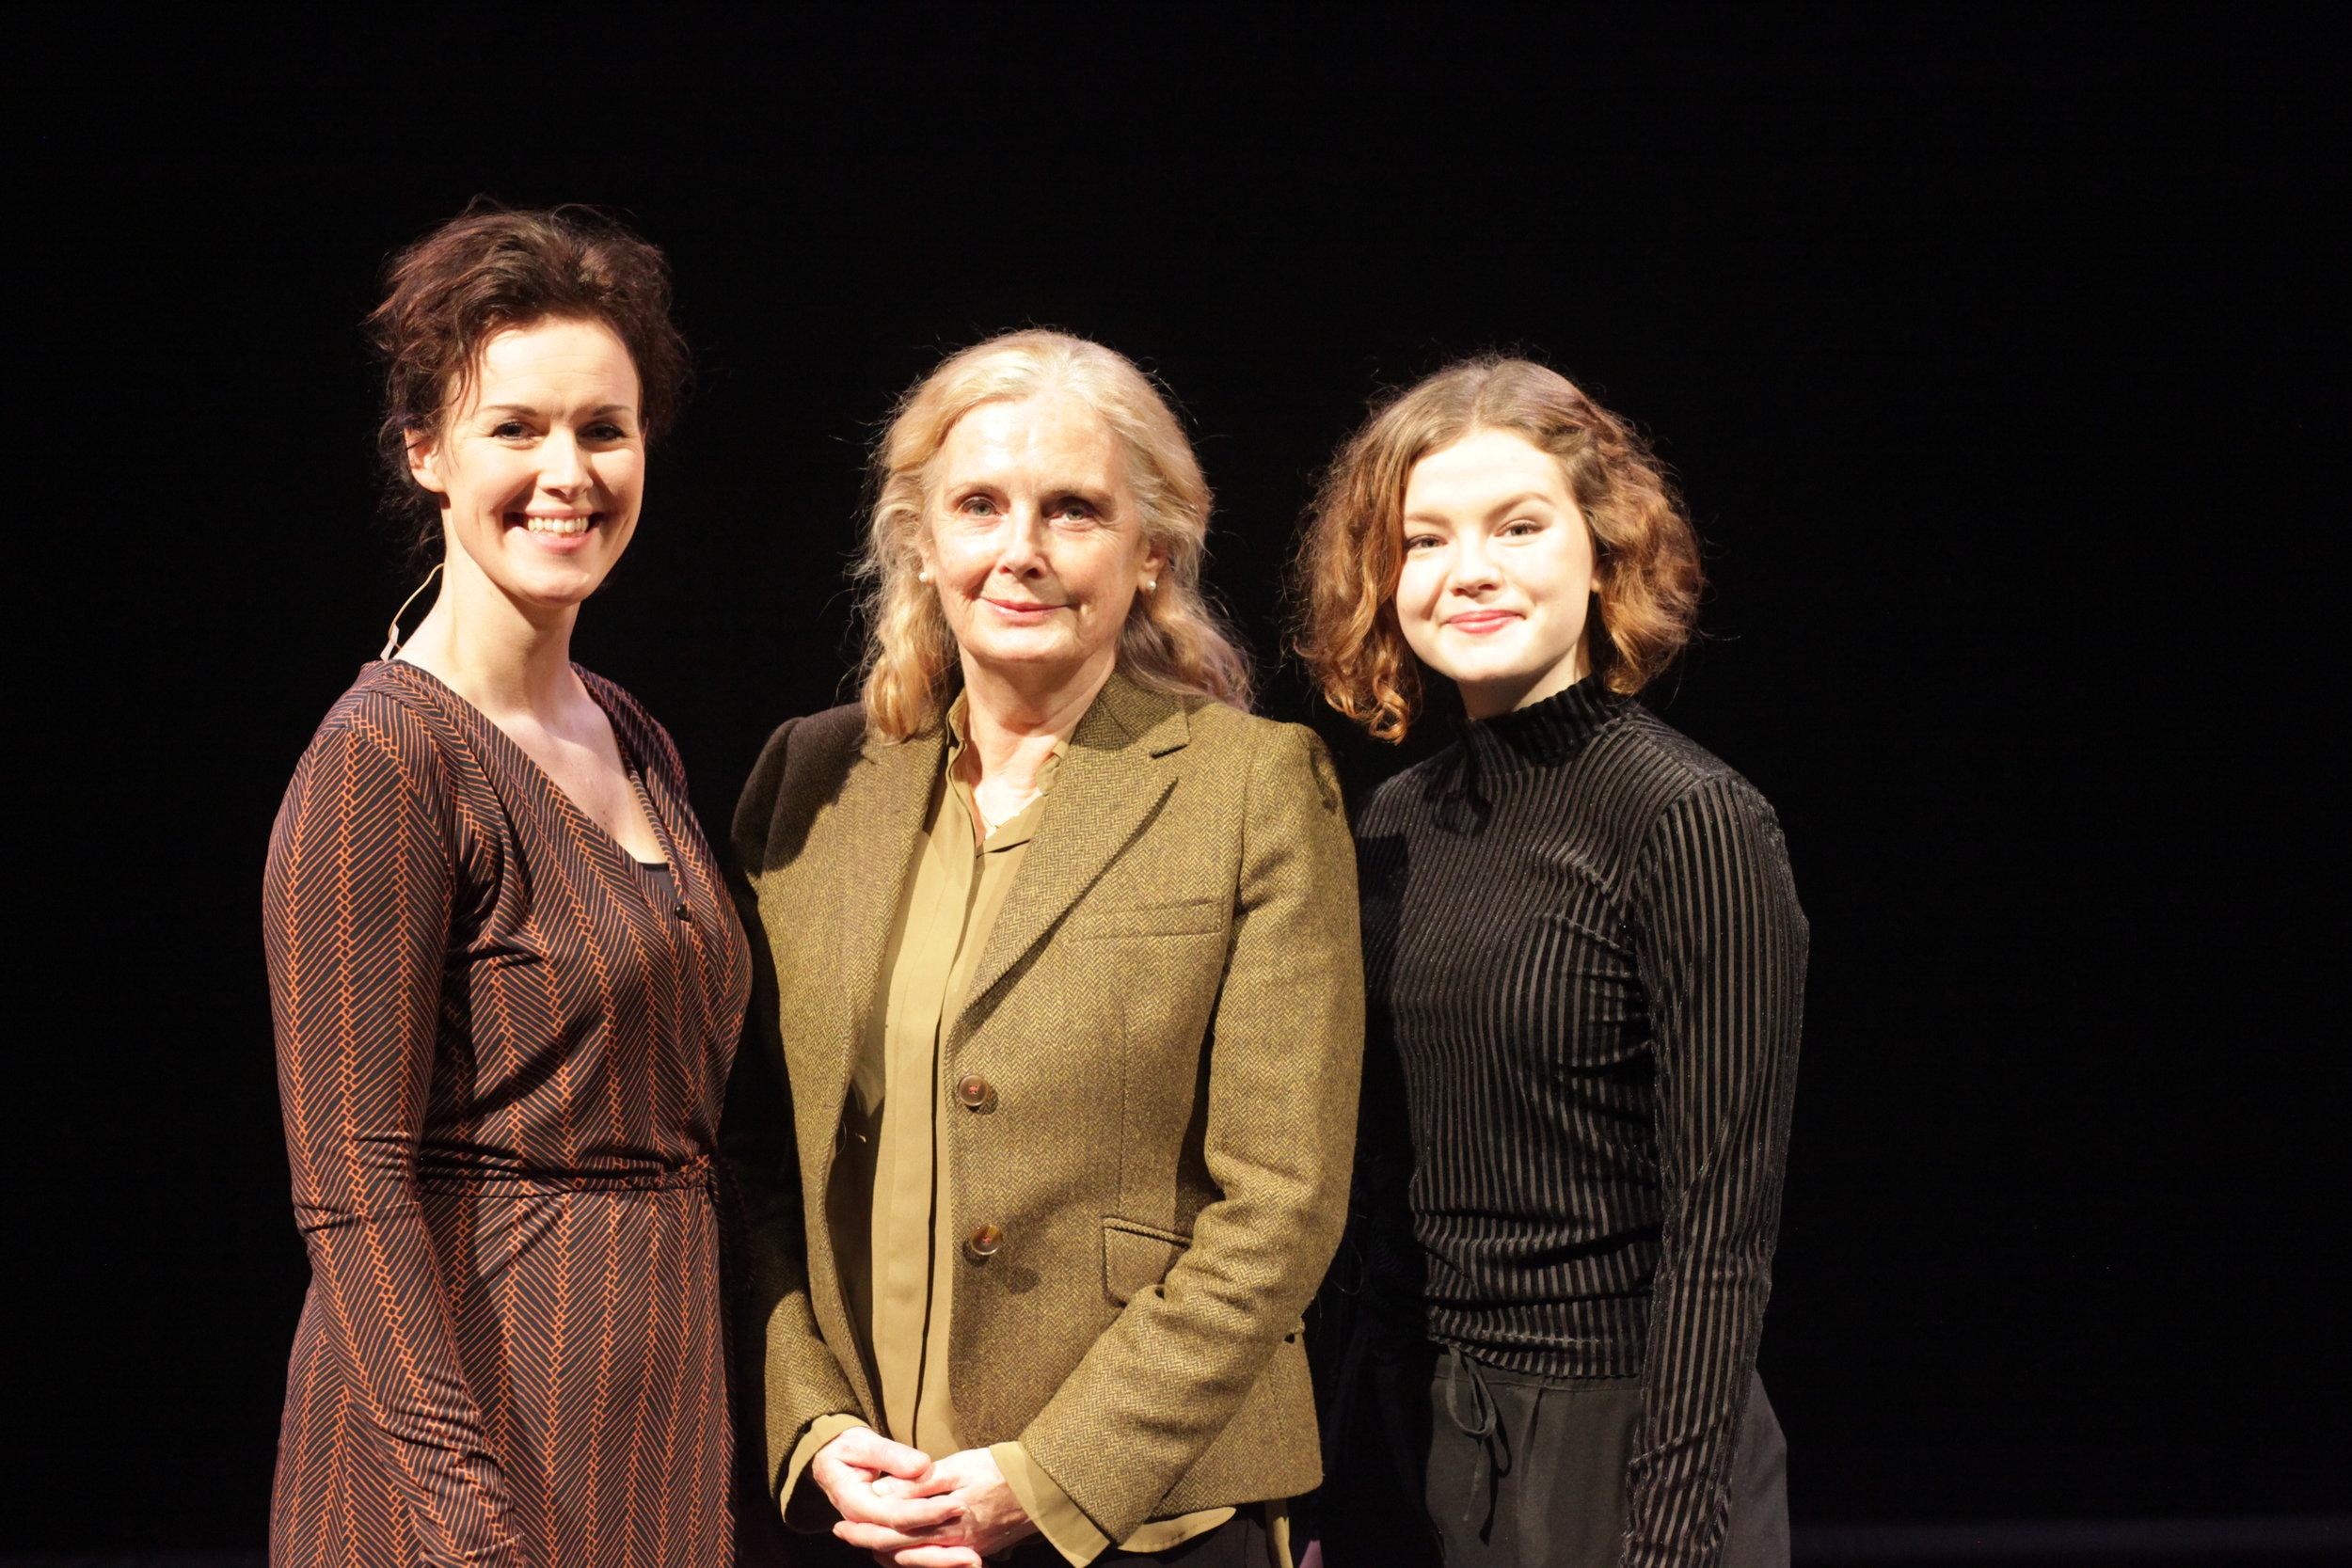 Idun Losnegård (Miriam si forteljing), regissør Marit Østbye, Reidun Melvær Berge (Maria Magdalena - Jesu virke). Foto David Bowen